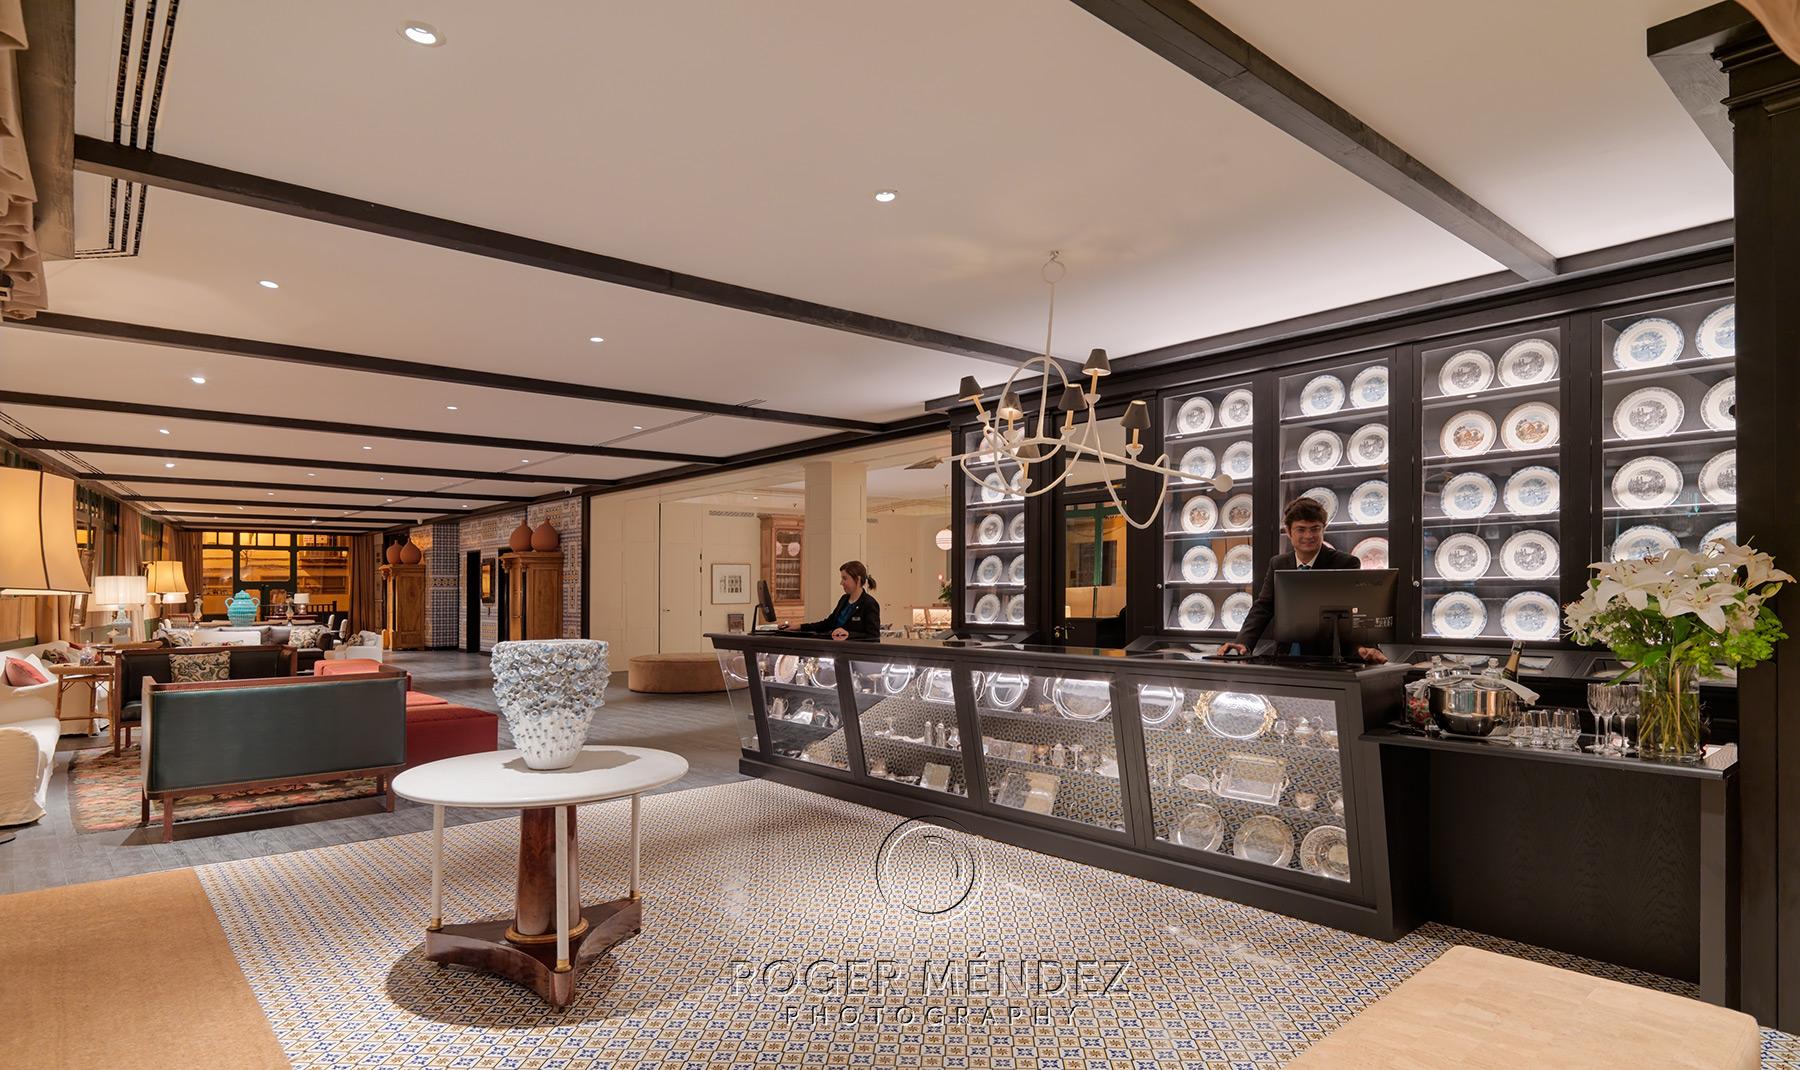 Vista general lobby de noche del hotel H10 Casa de la Plata